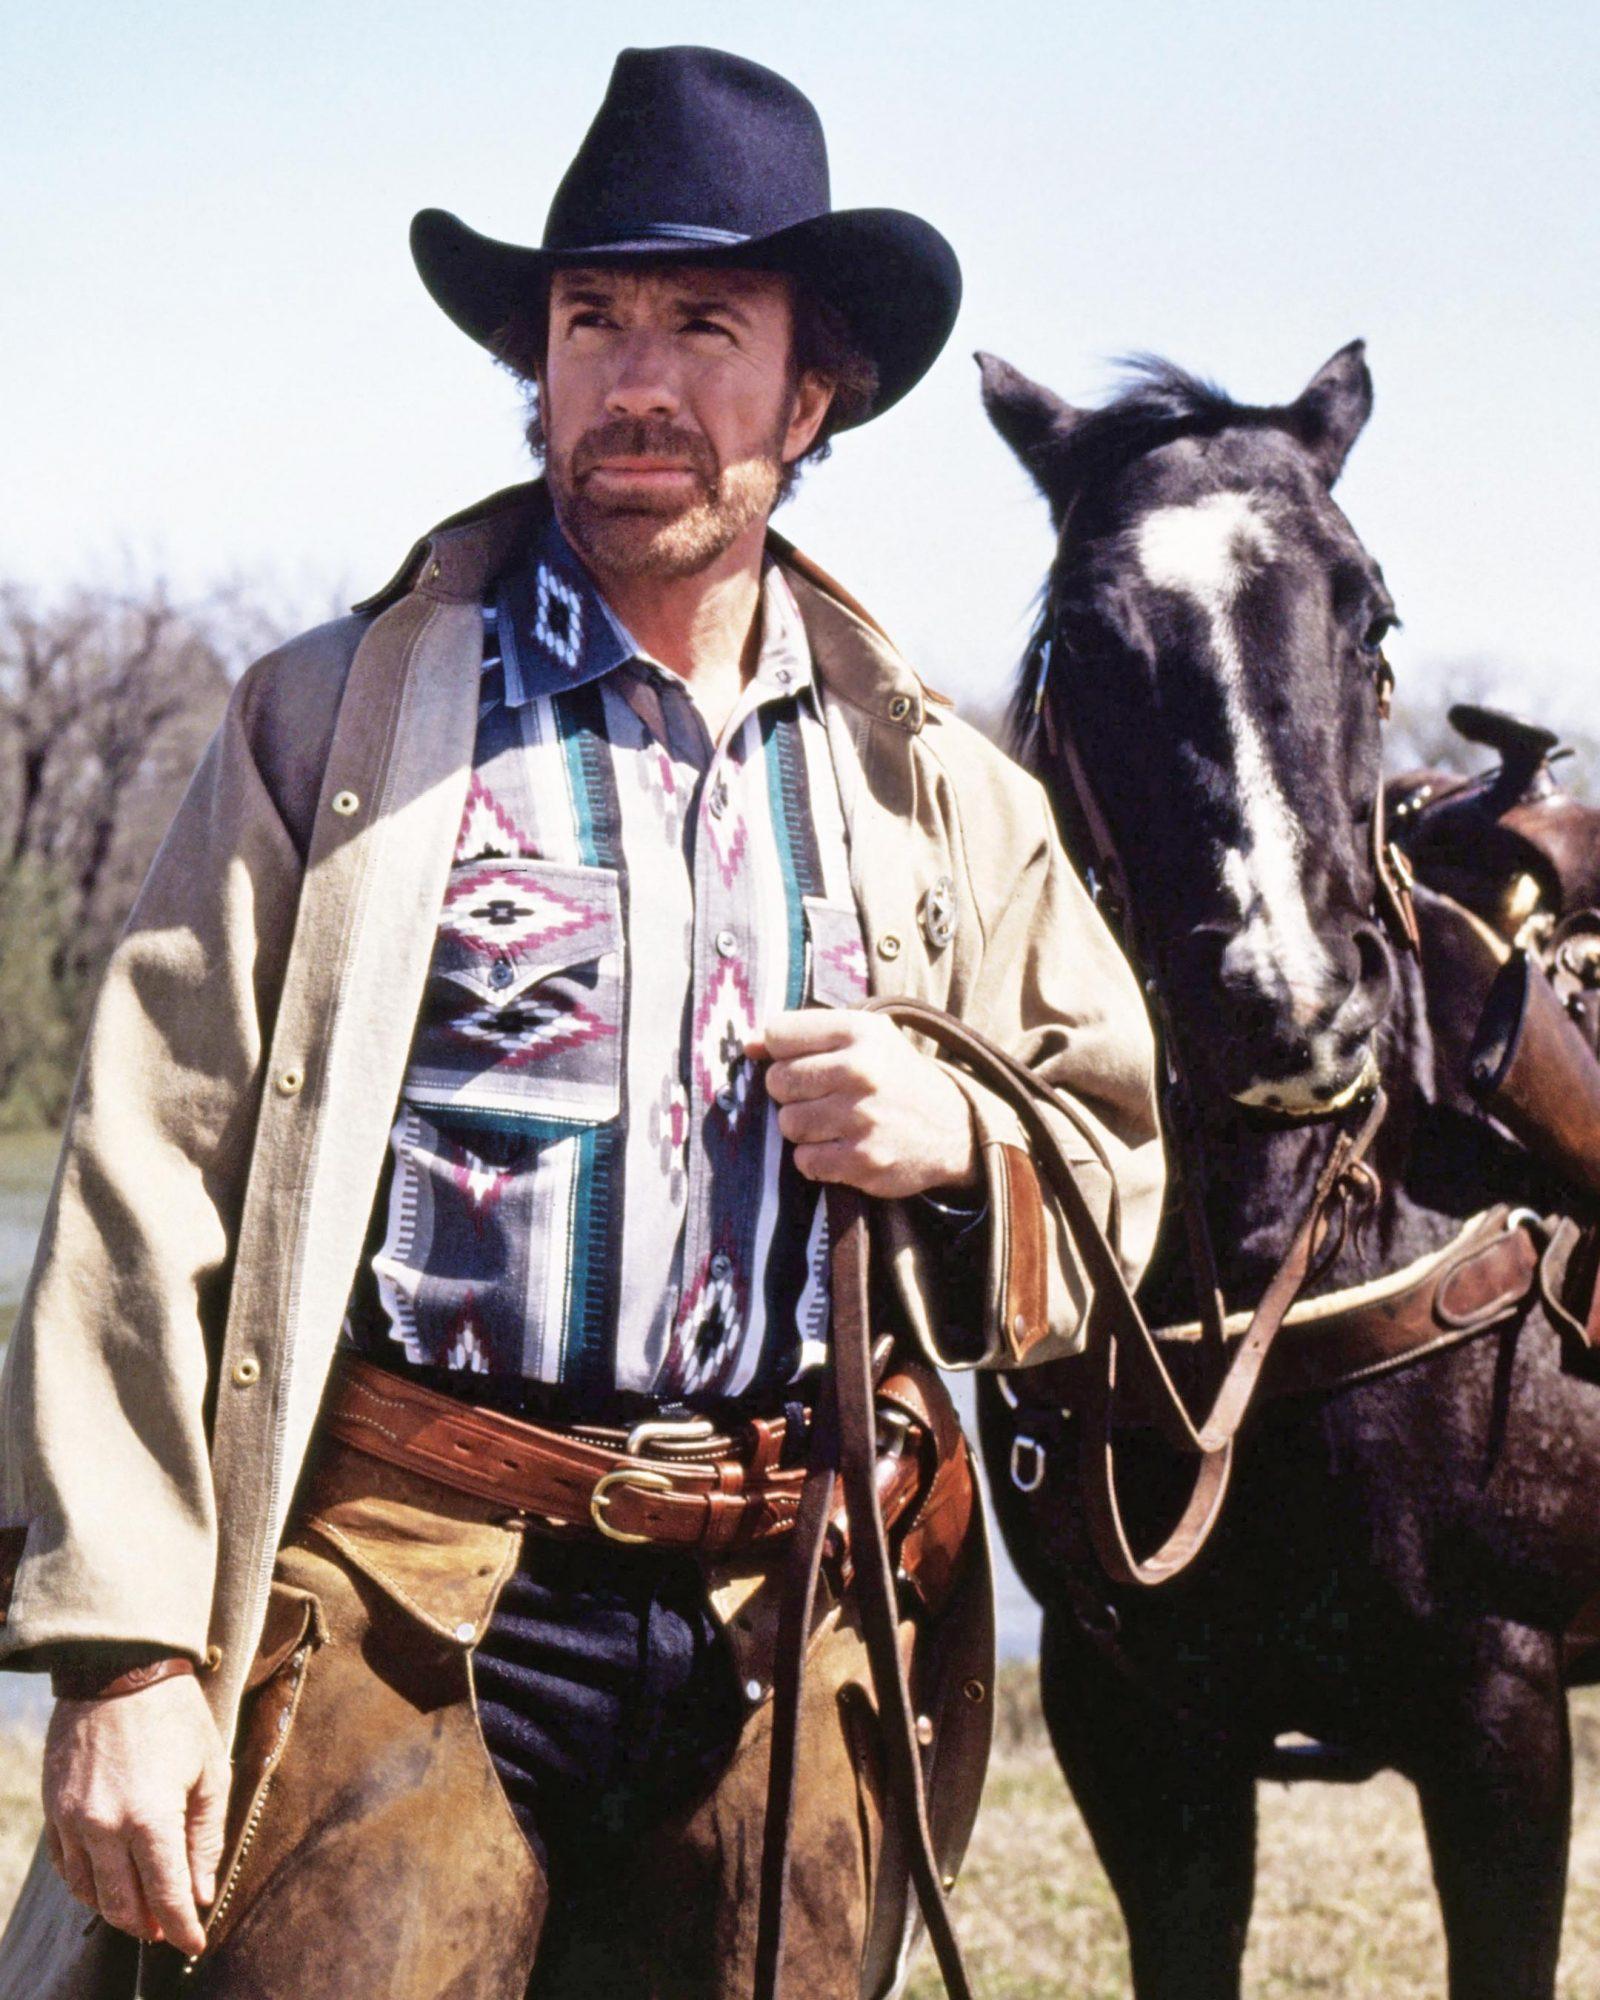 WALKER, TEXAS RANGER, Chuck Norris, 1993-2001, © CBS/courtesy Everett Collection